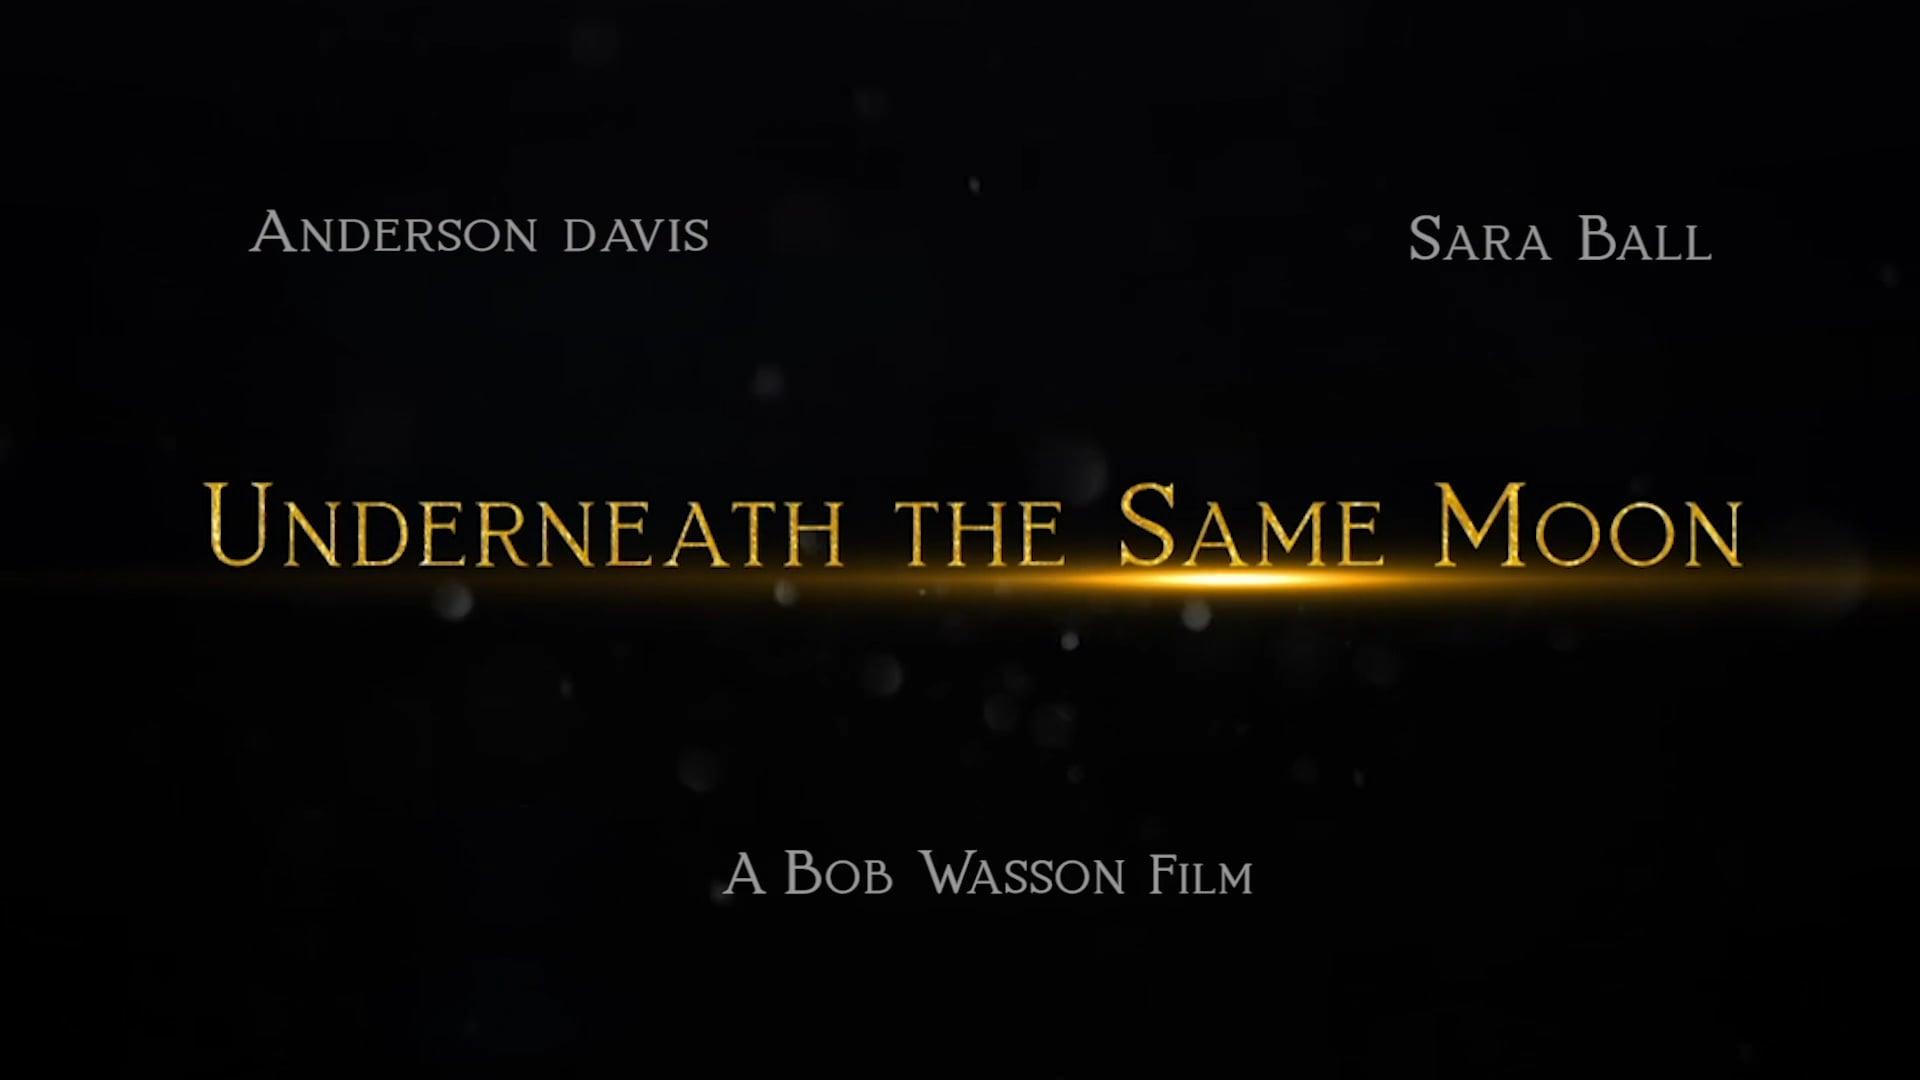 Underneath the Same Moon trailer